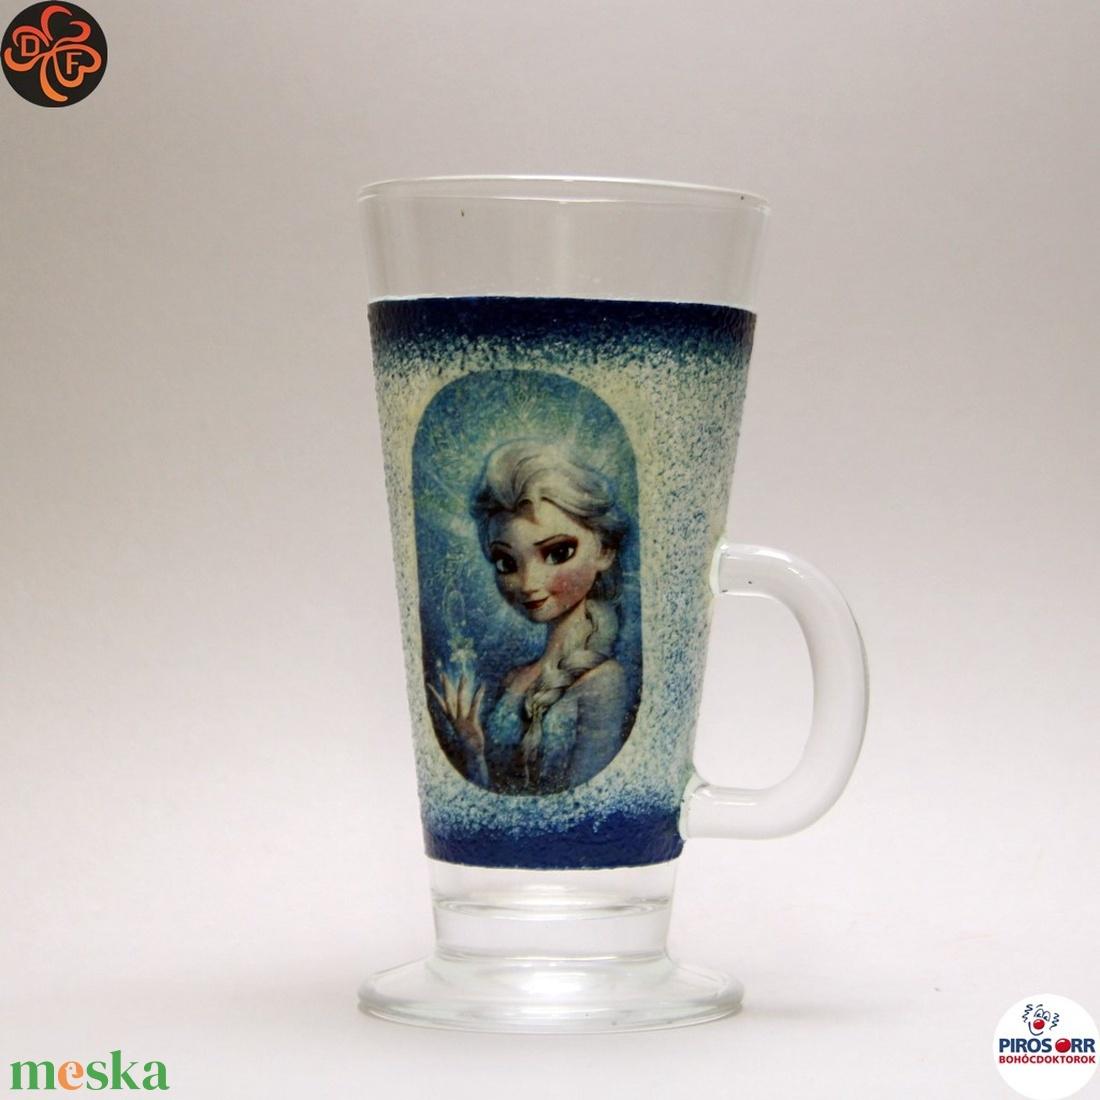 Pohár nagylányoknak, pohár hercegnőknek (decorfantasy) - Meska.hu